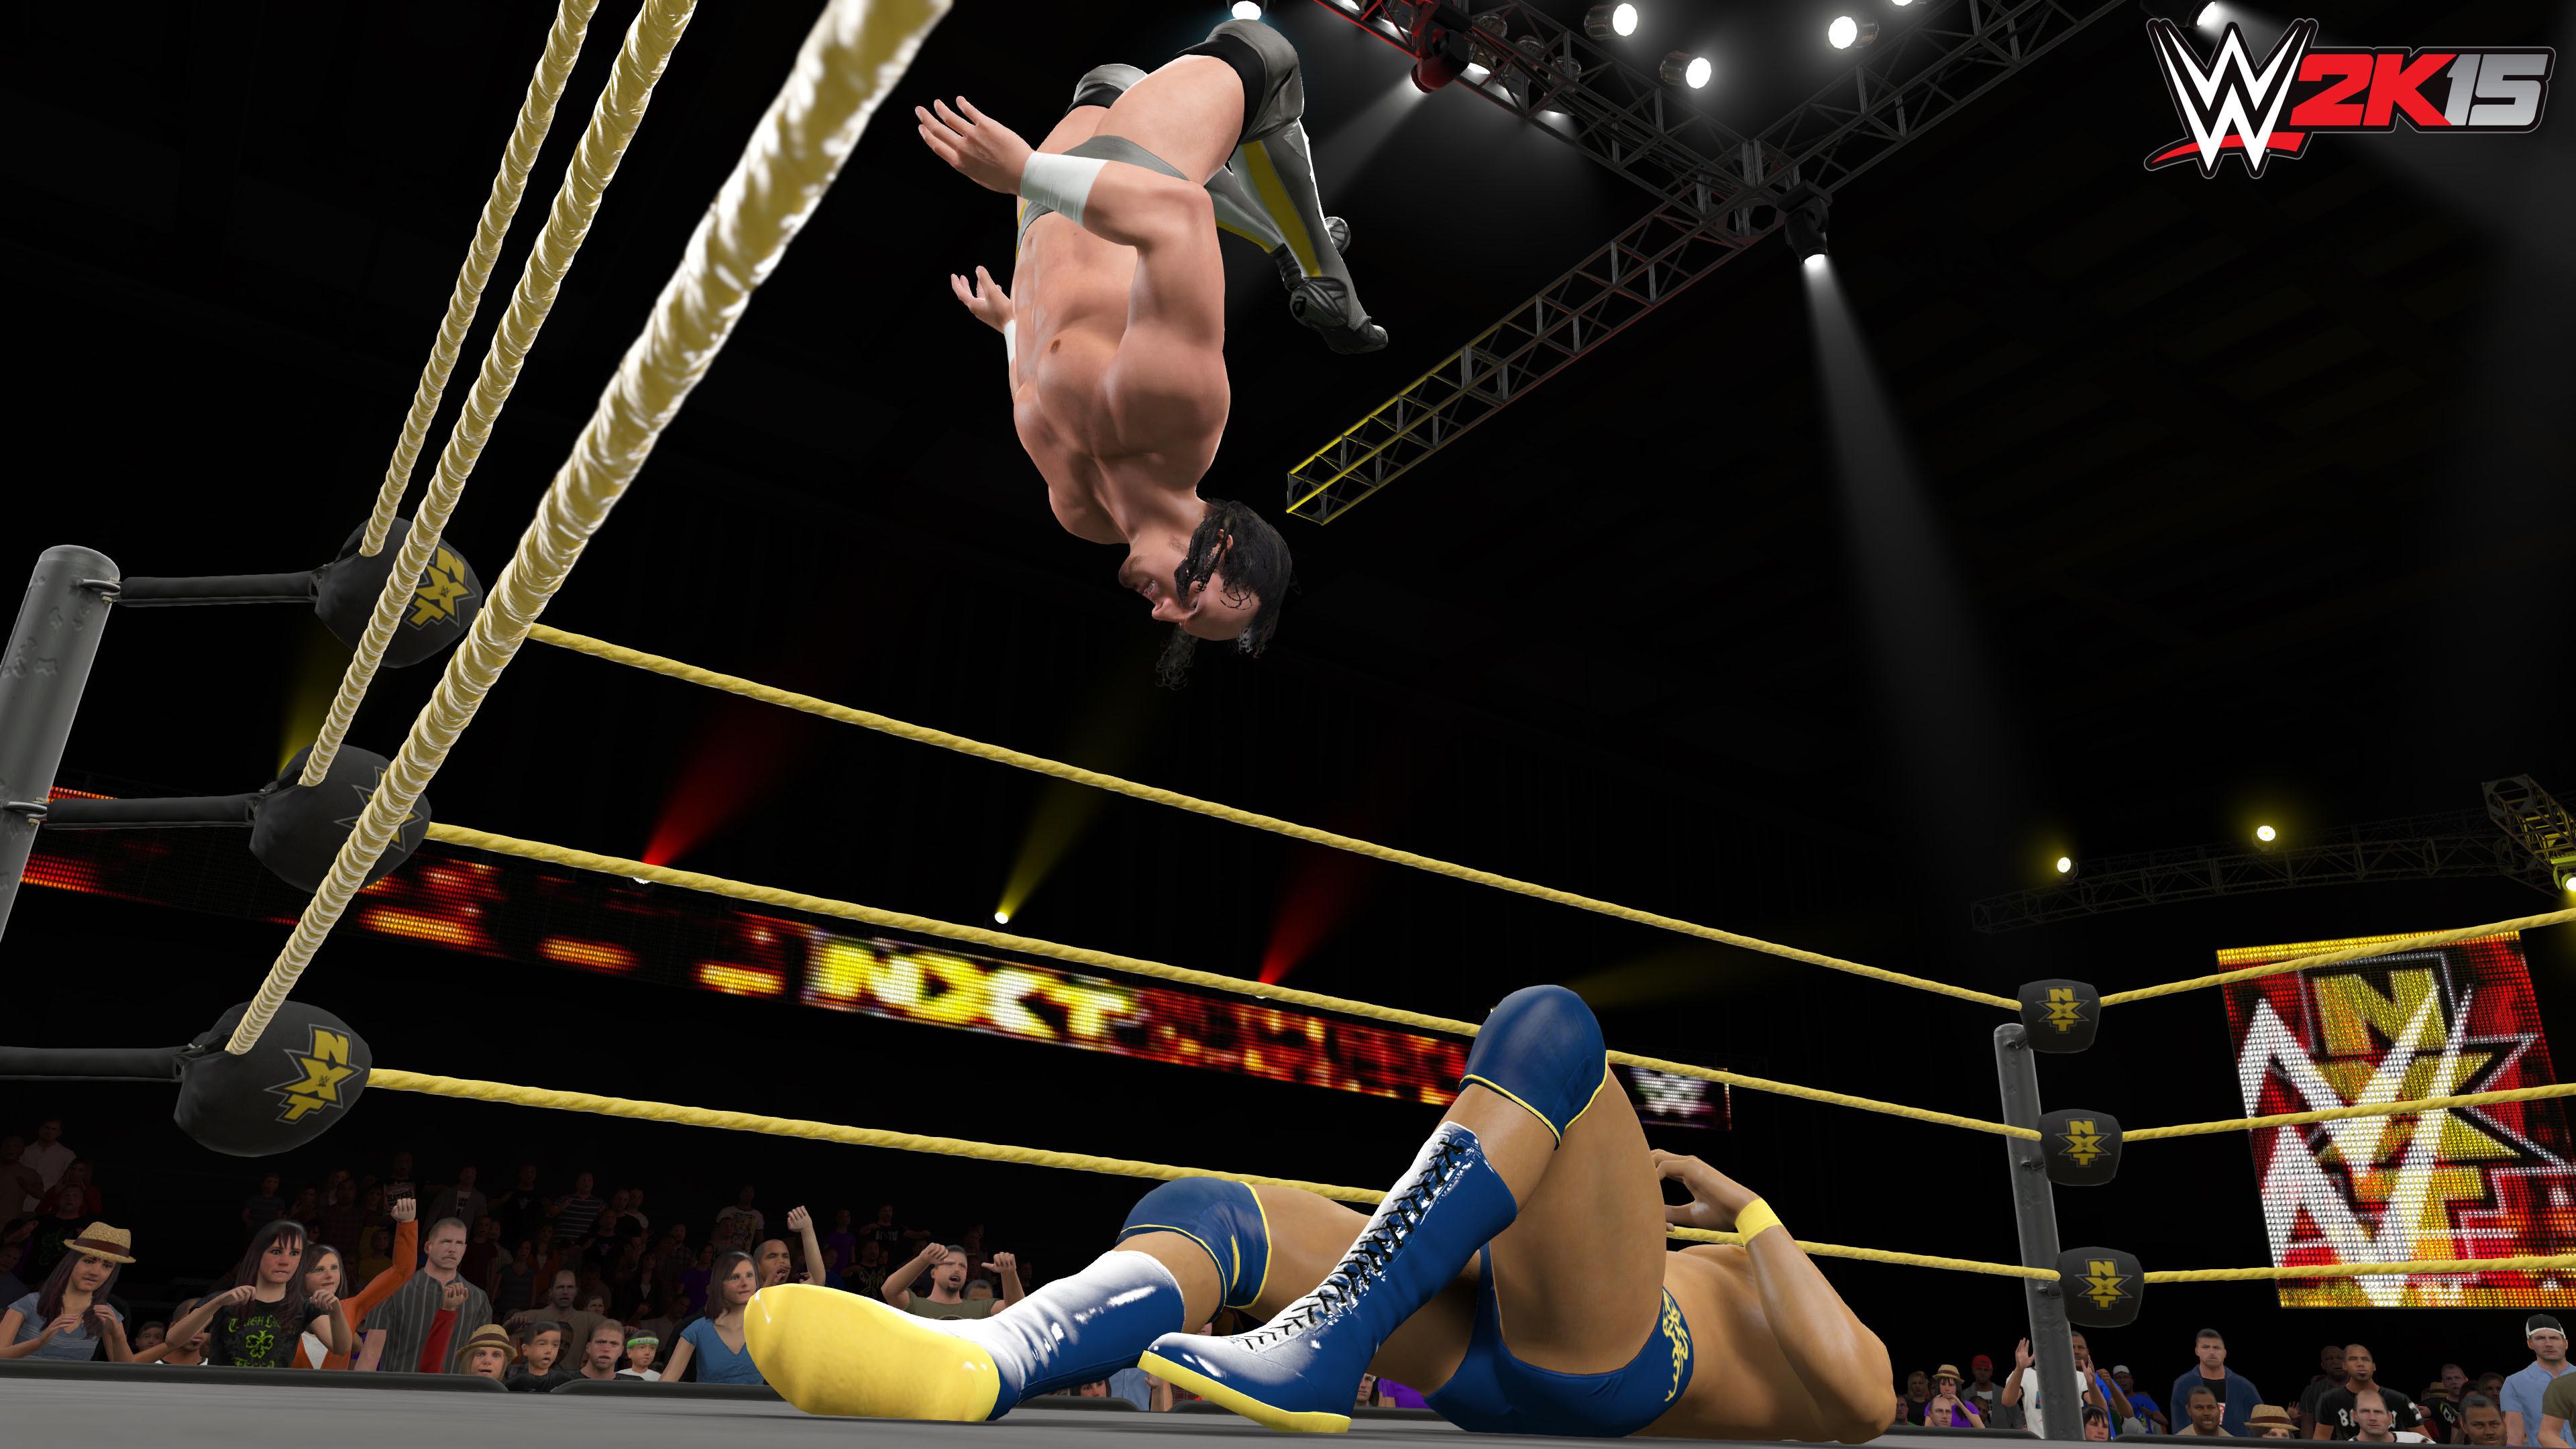 WWE 2K15 – CM Punk Flying Jump wallpaper